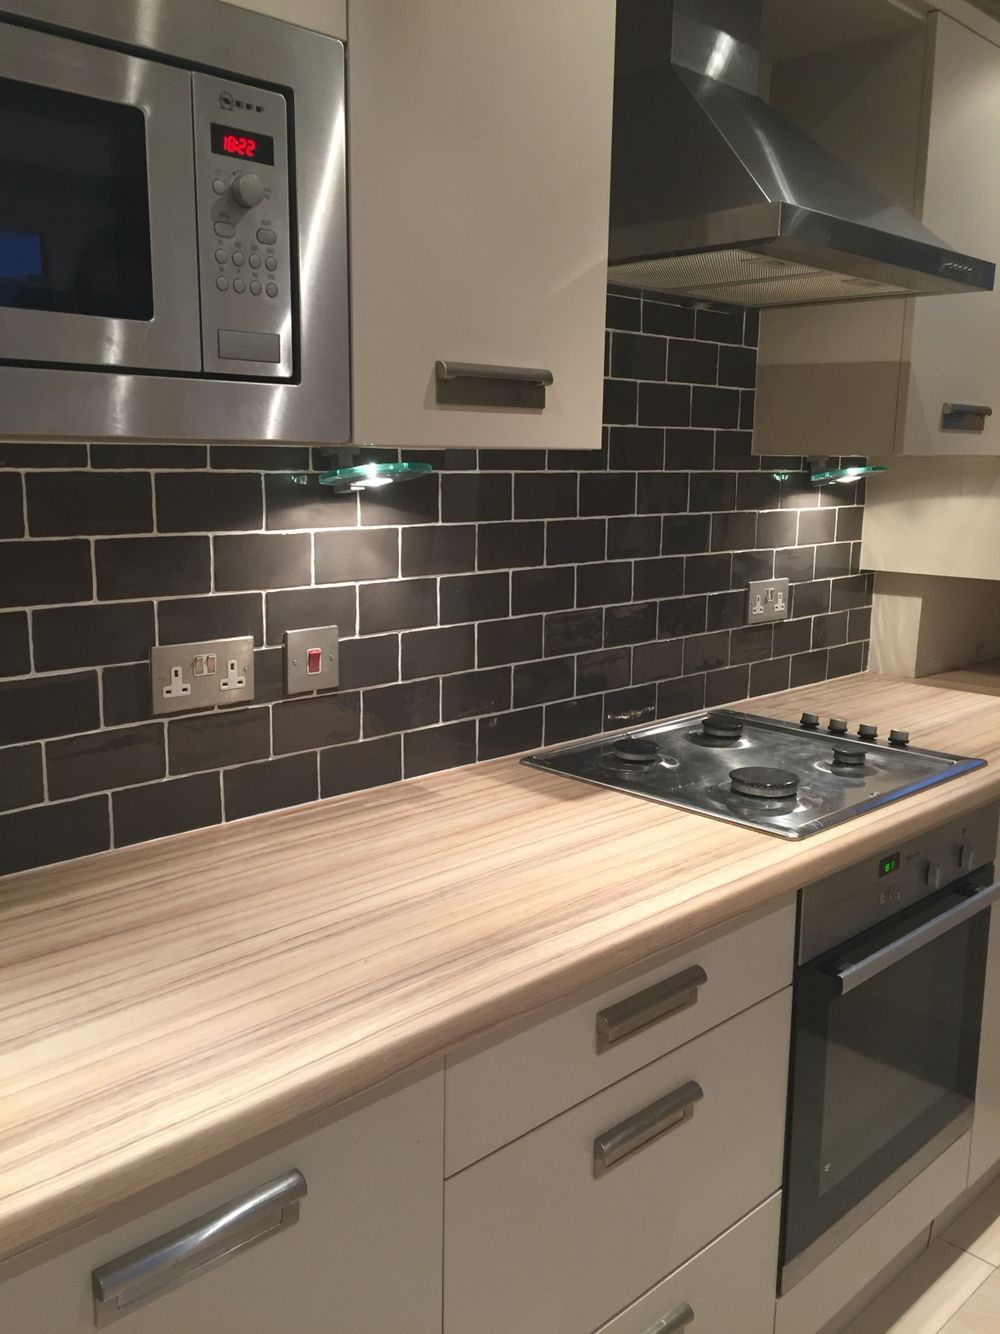 Grey Kitchen Tile Fingerhut Tiles Cream Hyperion Graphite Cocina Almond